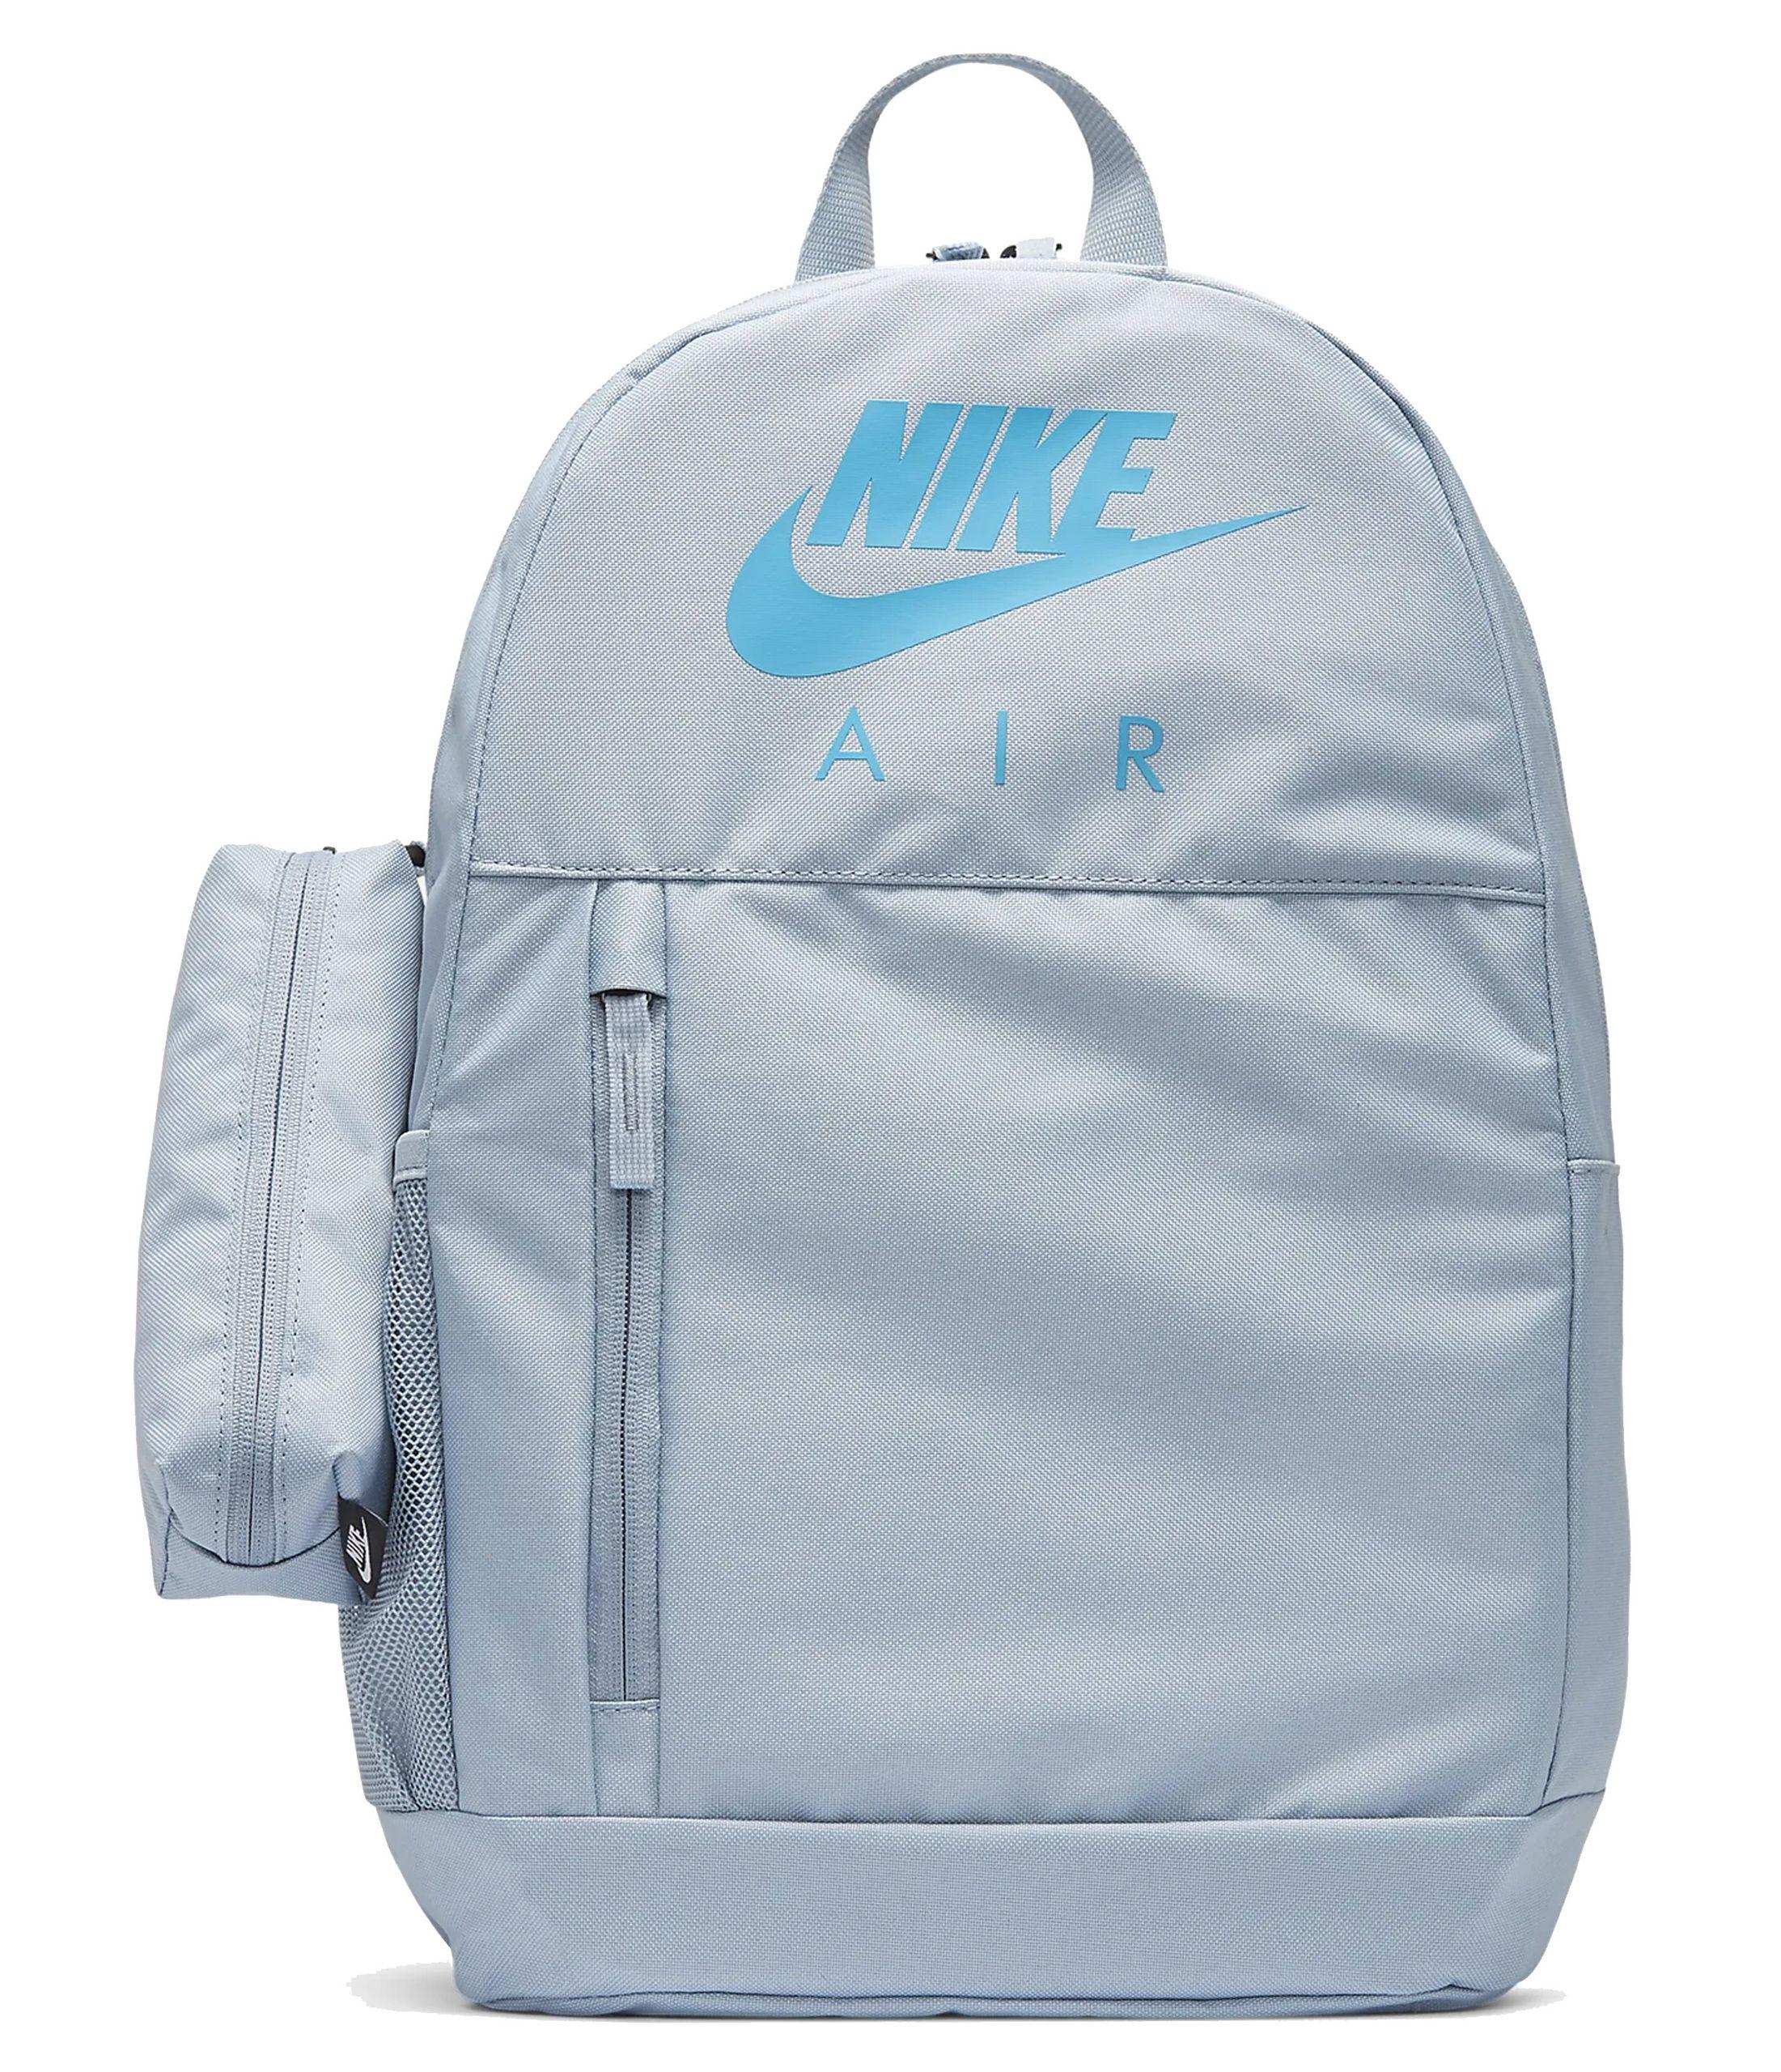 /api/products/30328